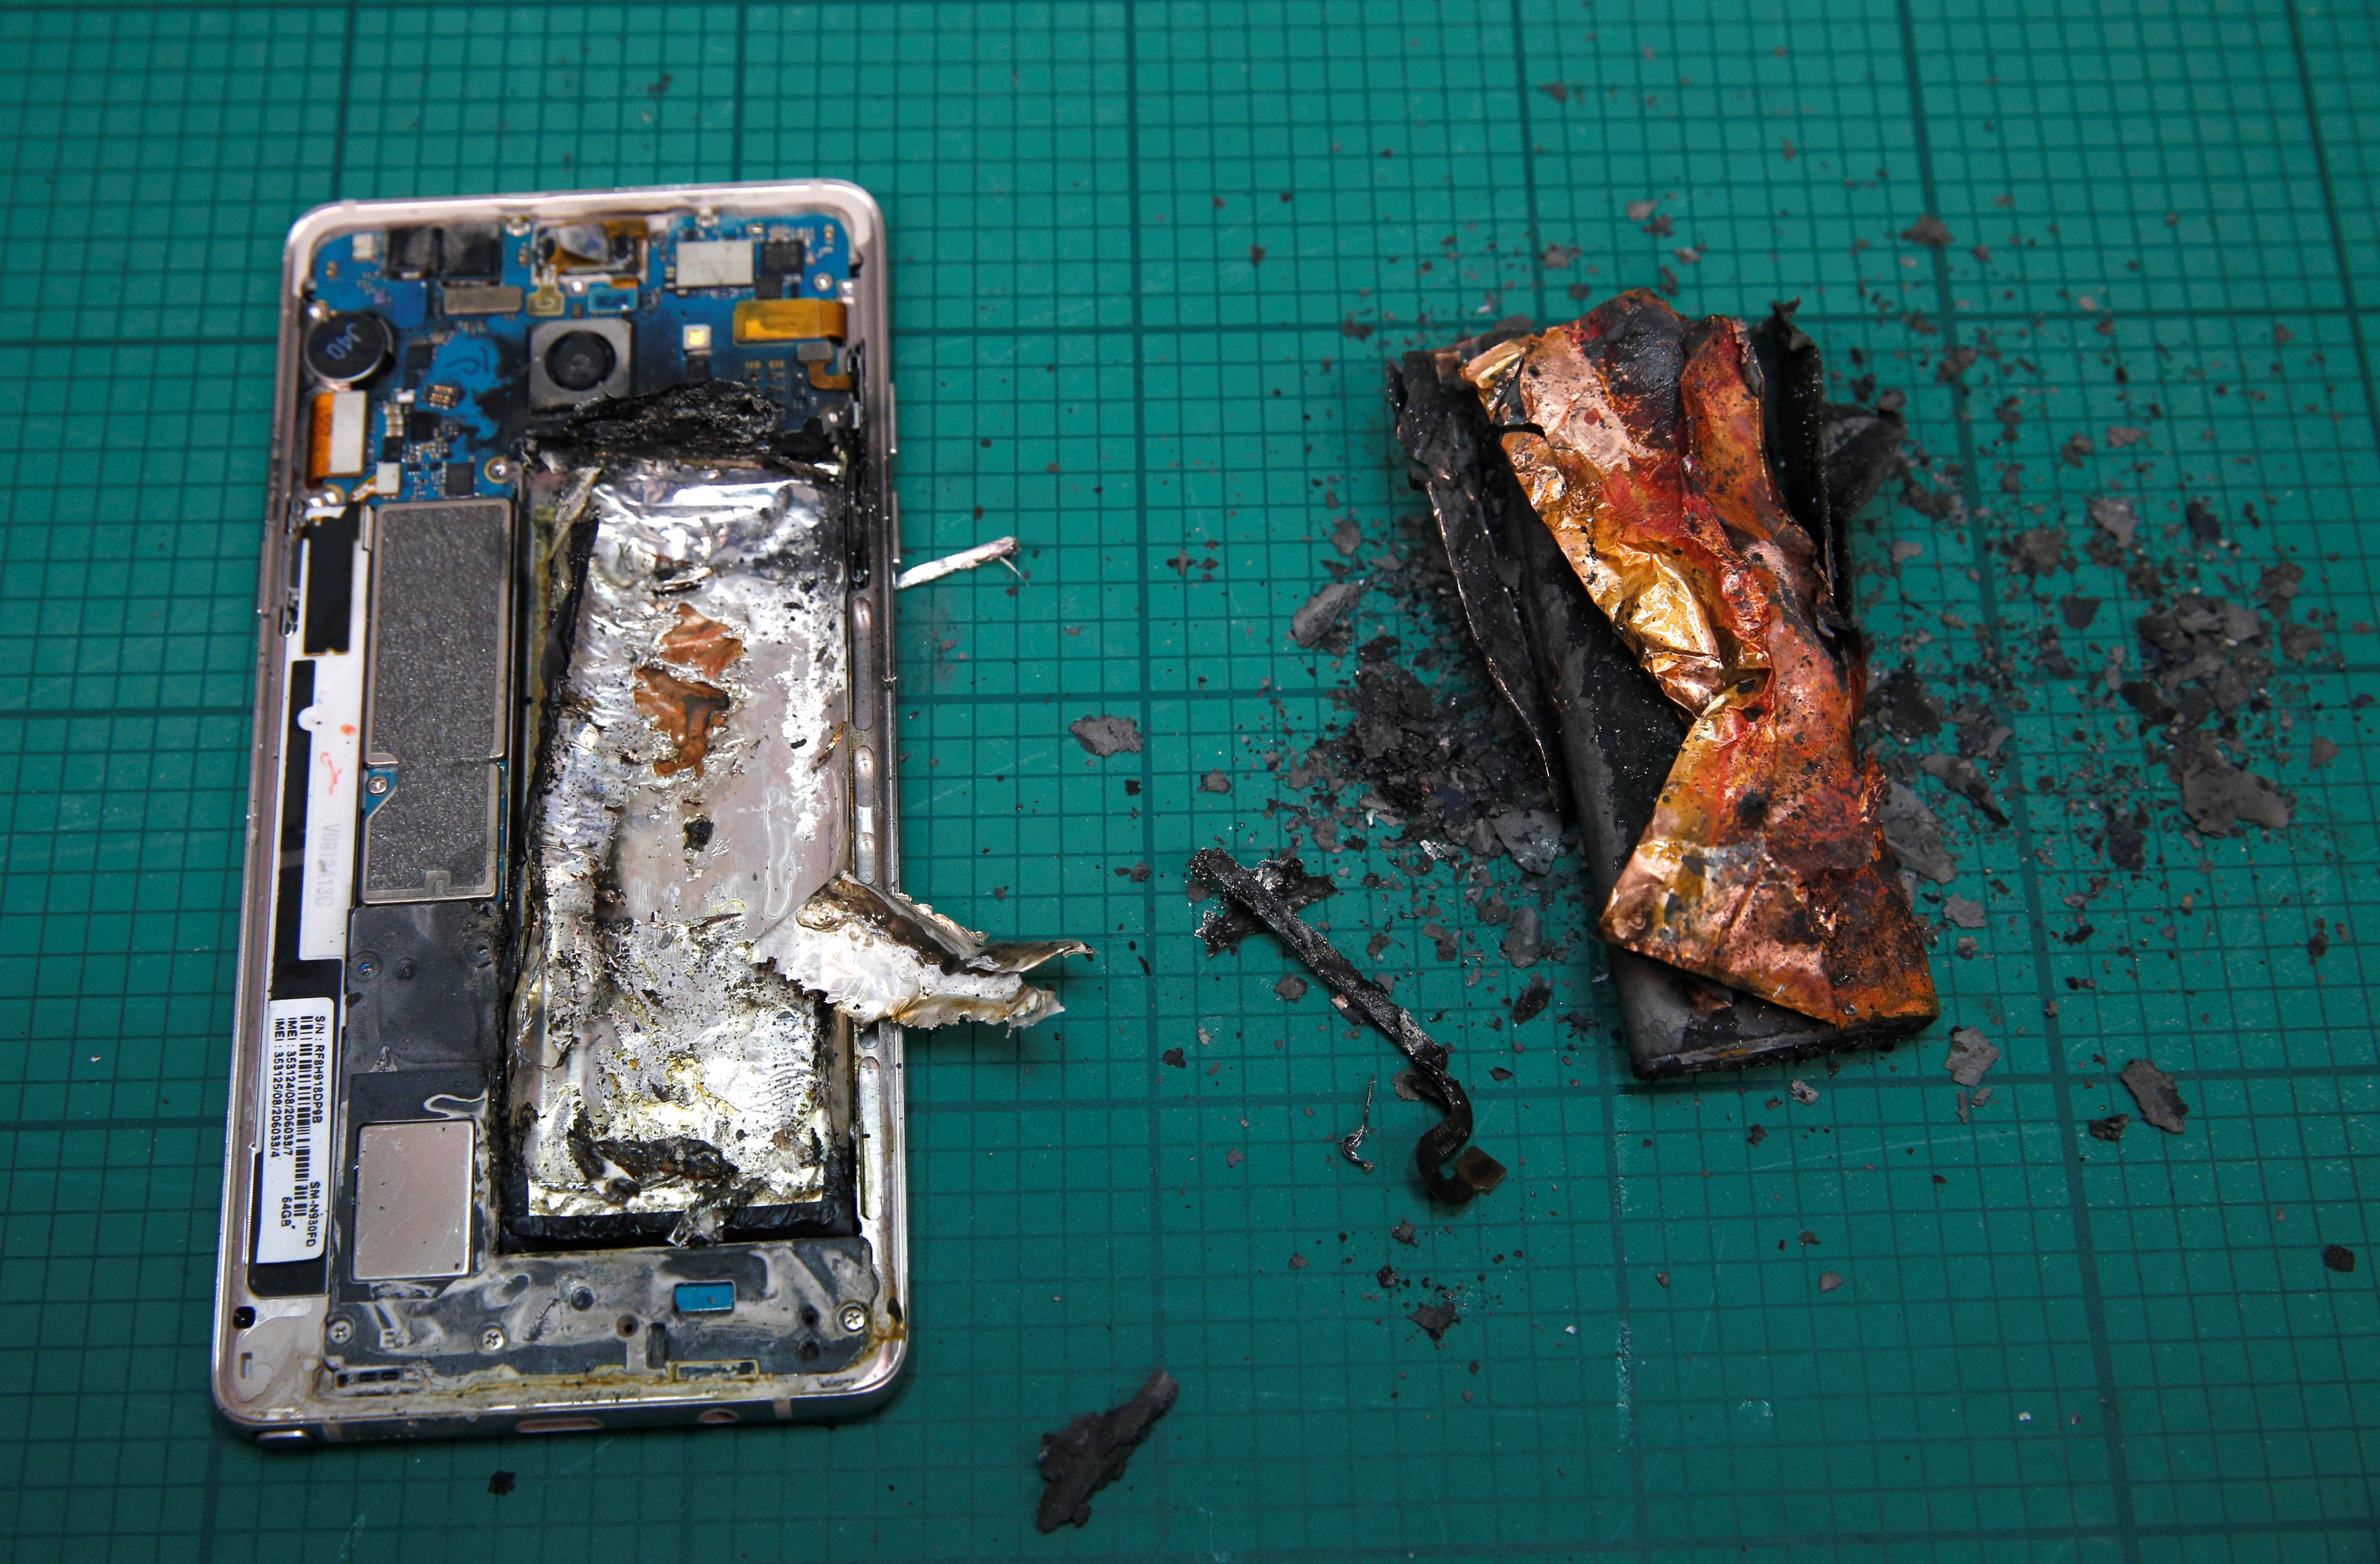 Samsung Halts Production, Sales Of Galaxy Note